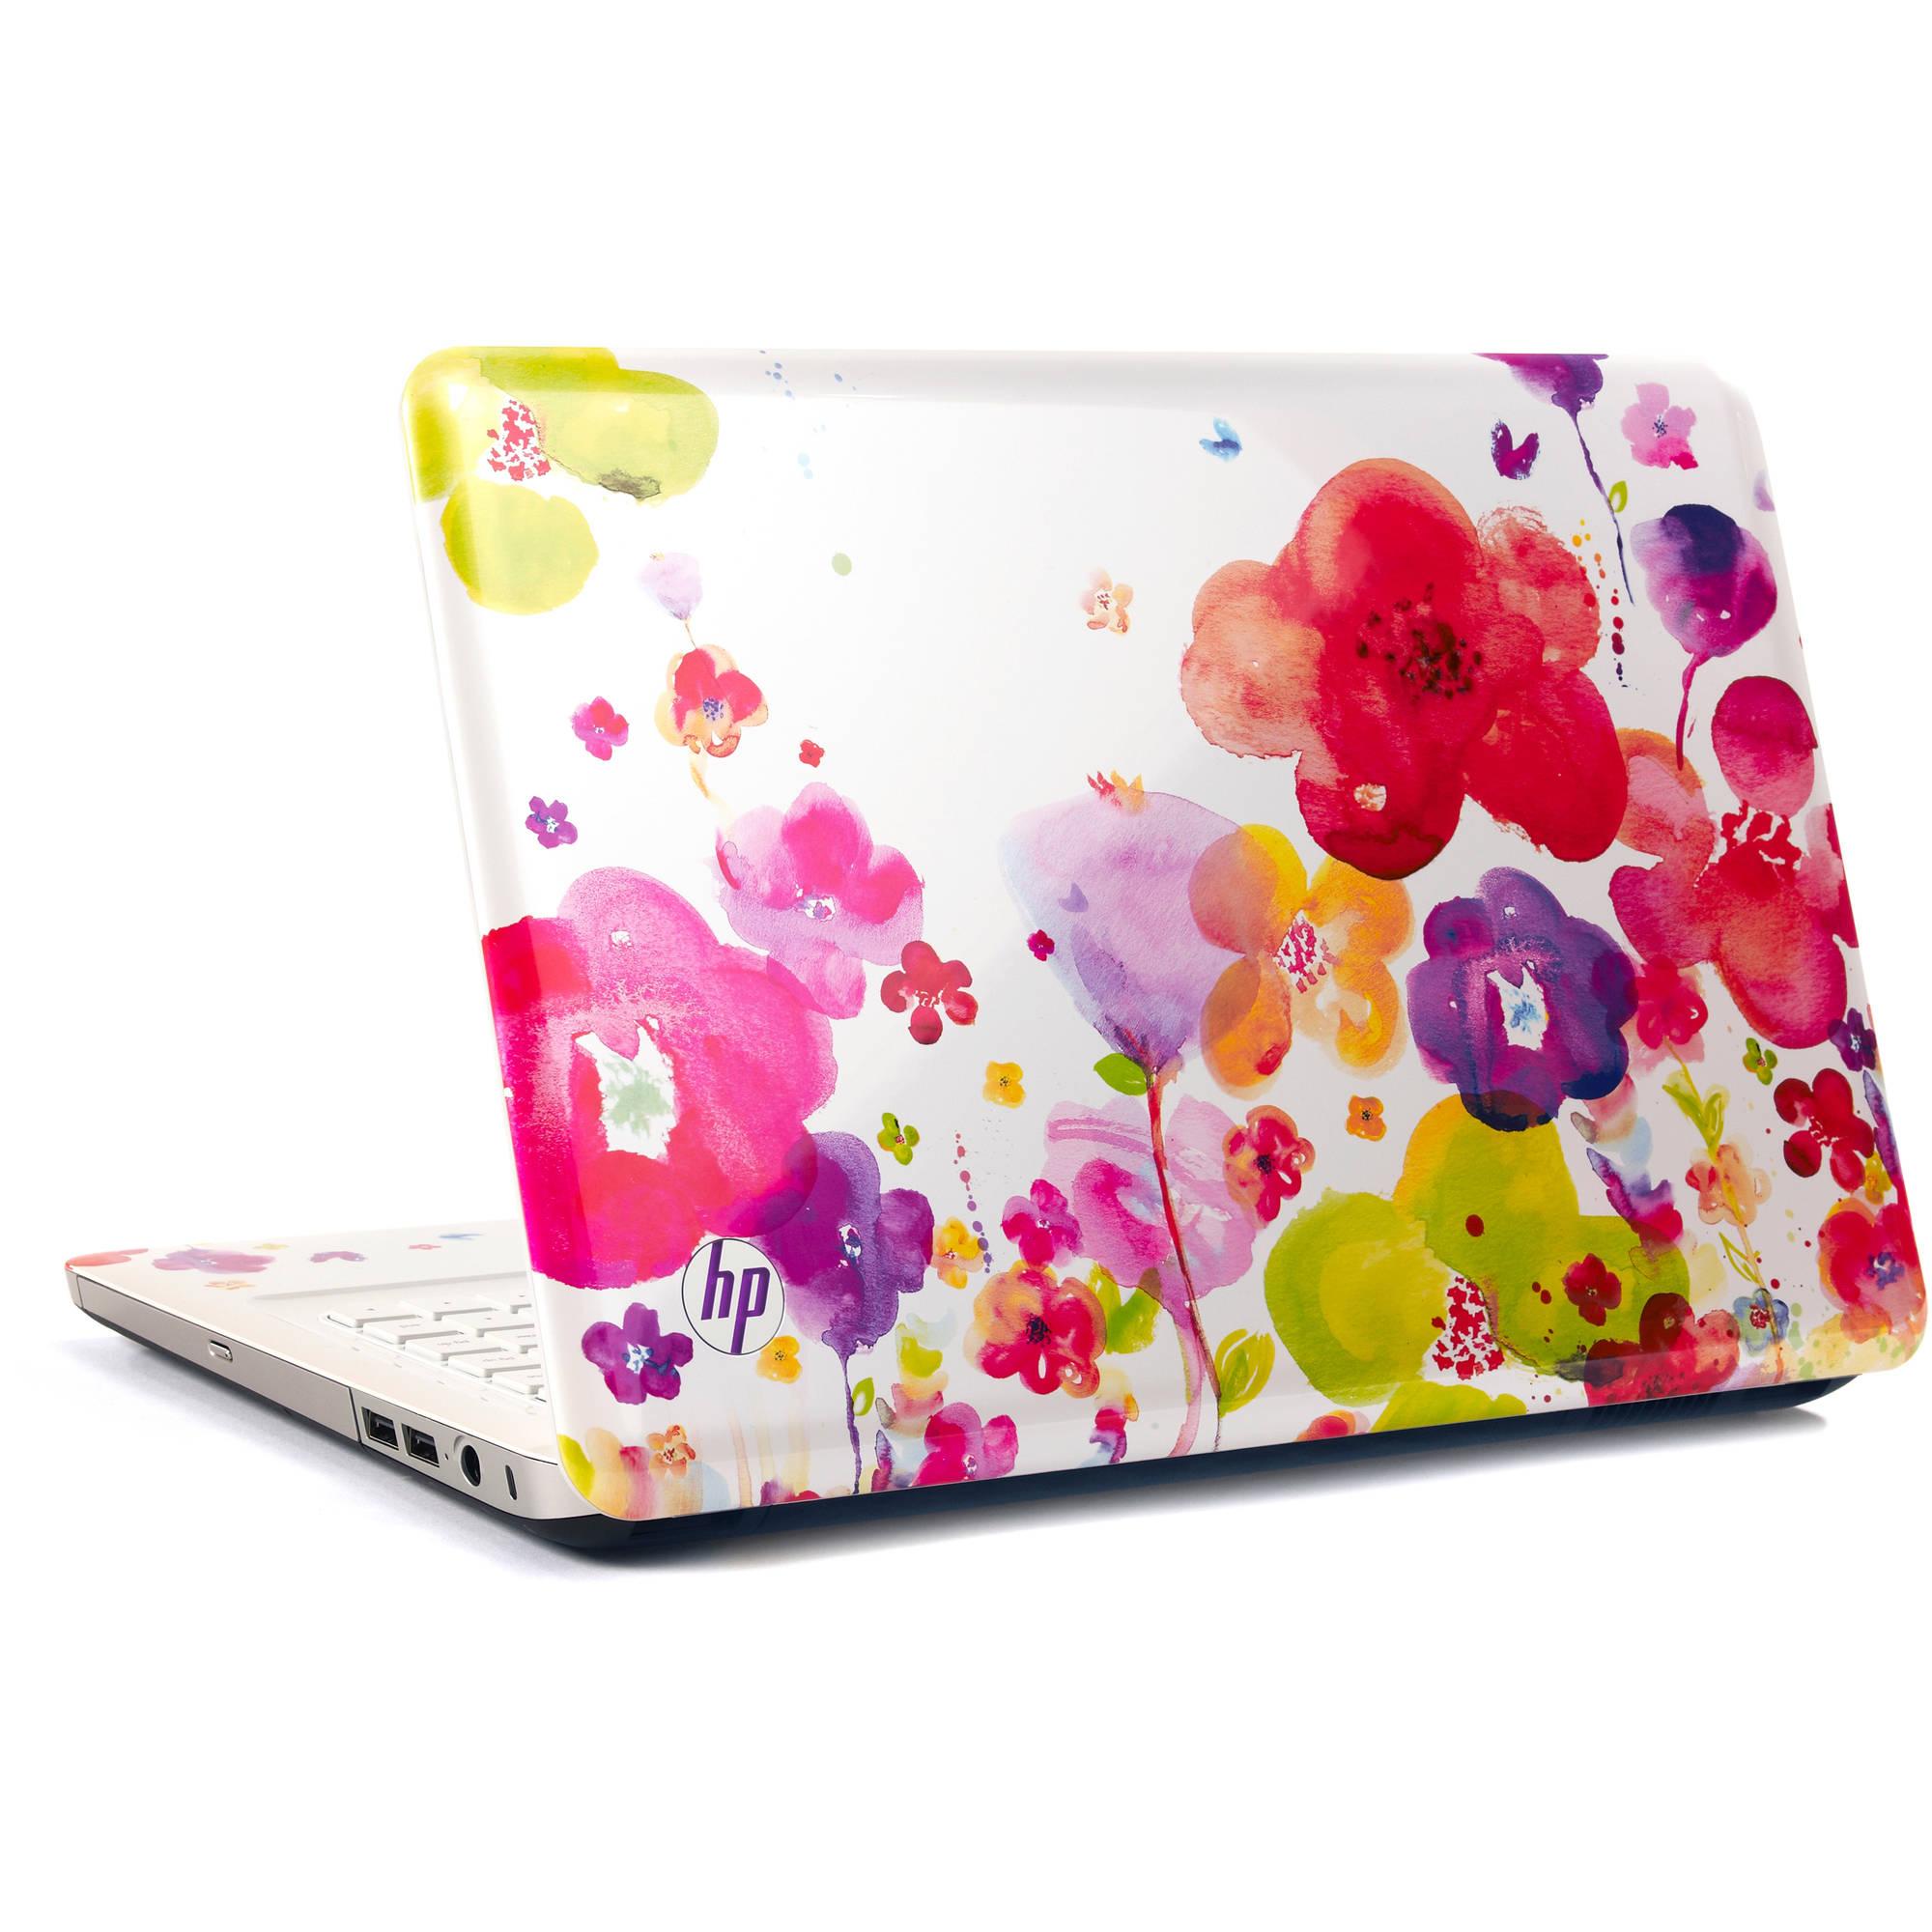 "HP Garden Dreams 14 5"" Pavilion dv5 2129wm Special Edition Laptop PC"